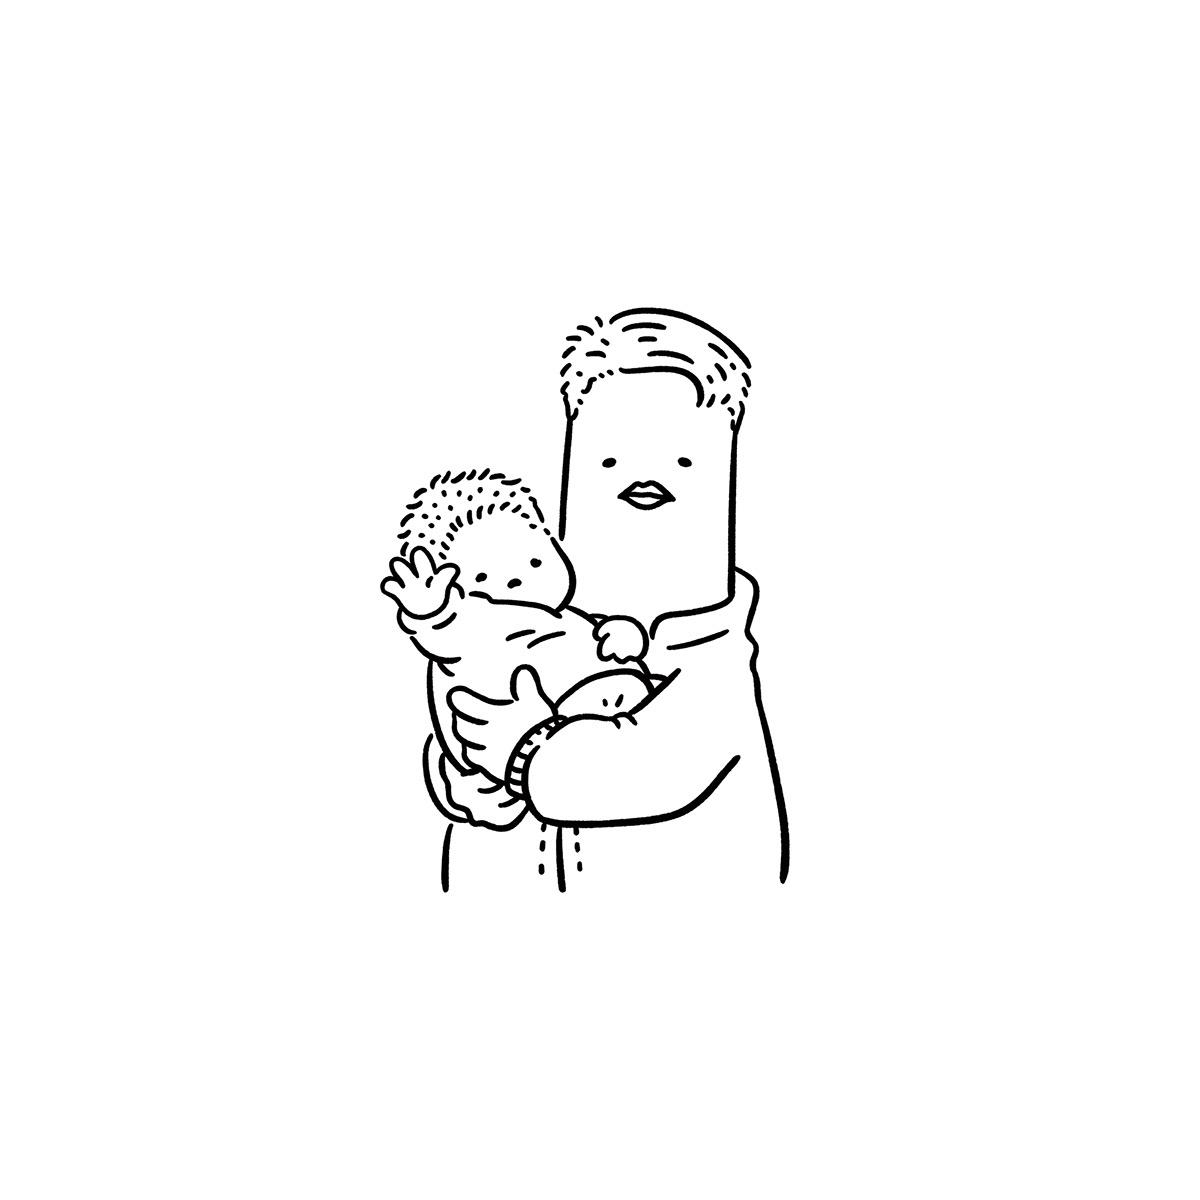 popoland 波寶島 插畫 插圖 繪圖 繪畫 ILLUSTRATION  イラスト 藝術 art